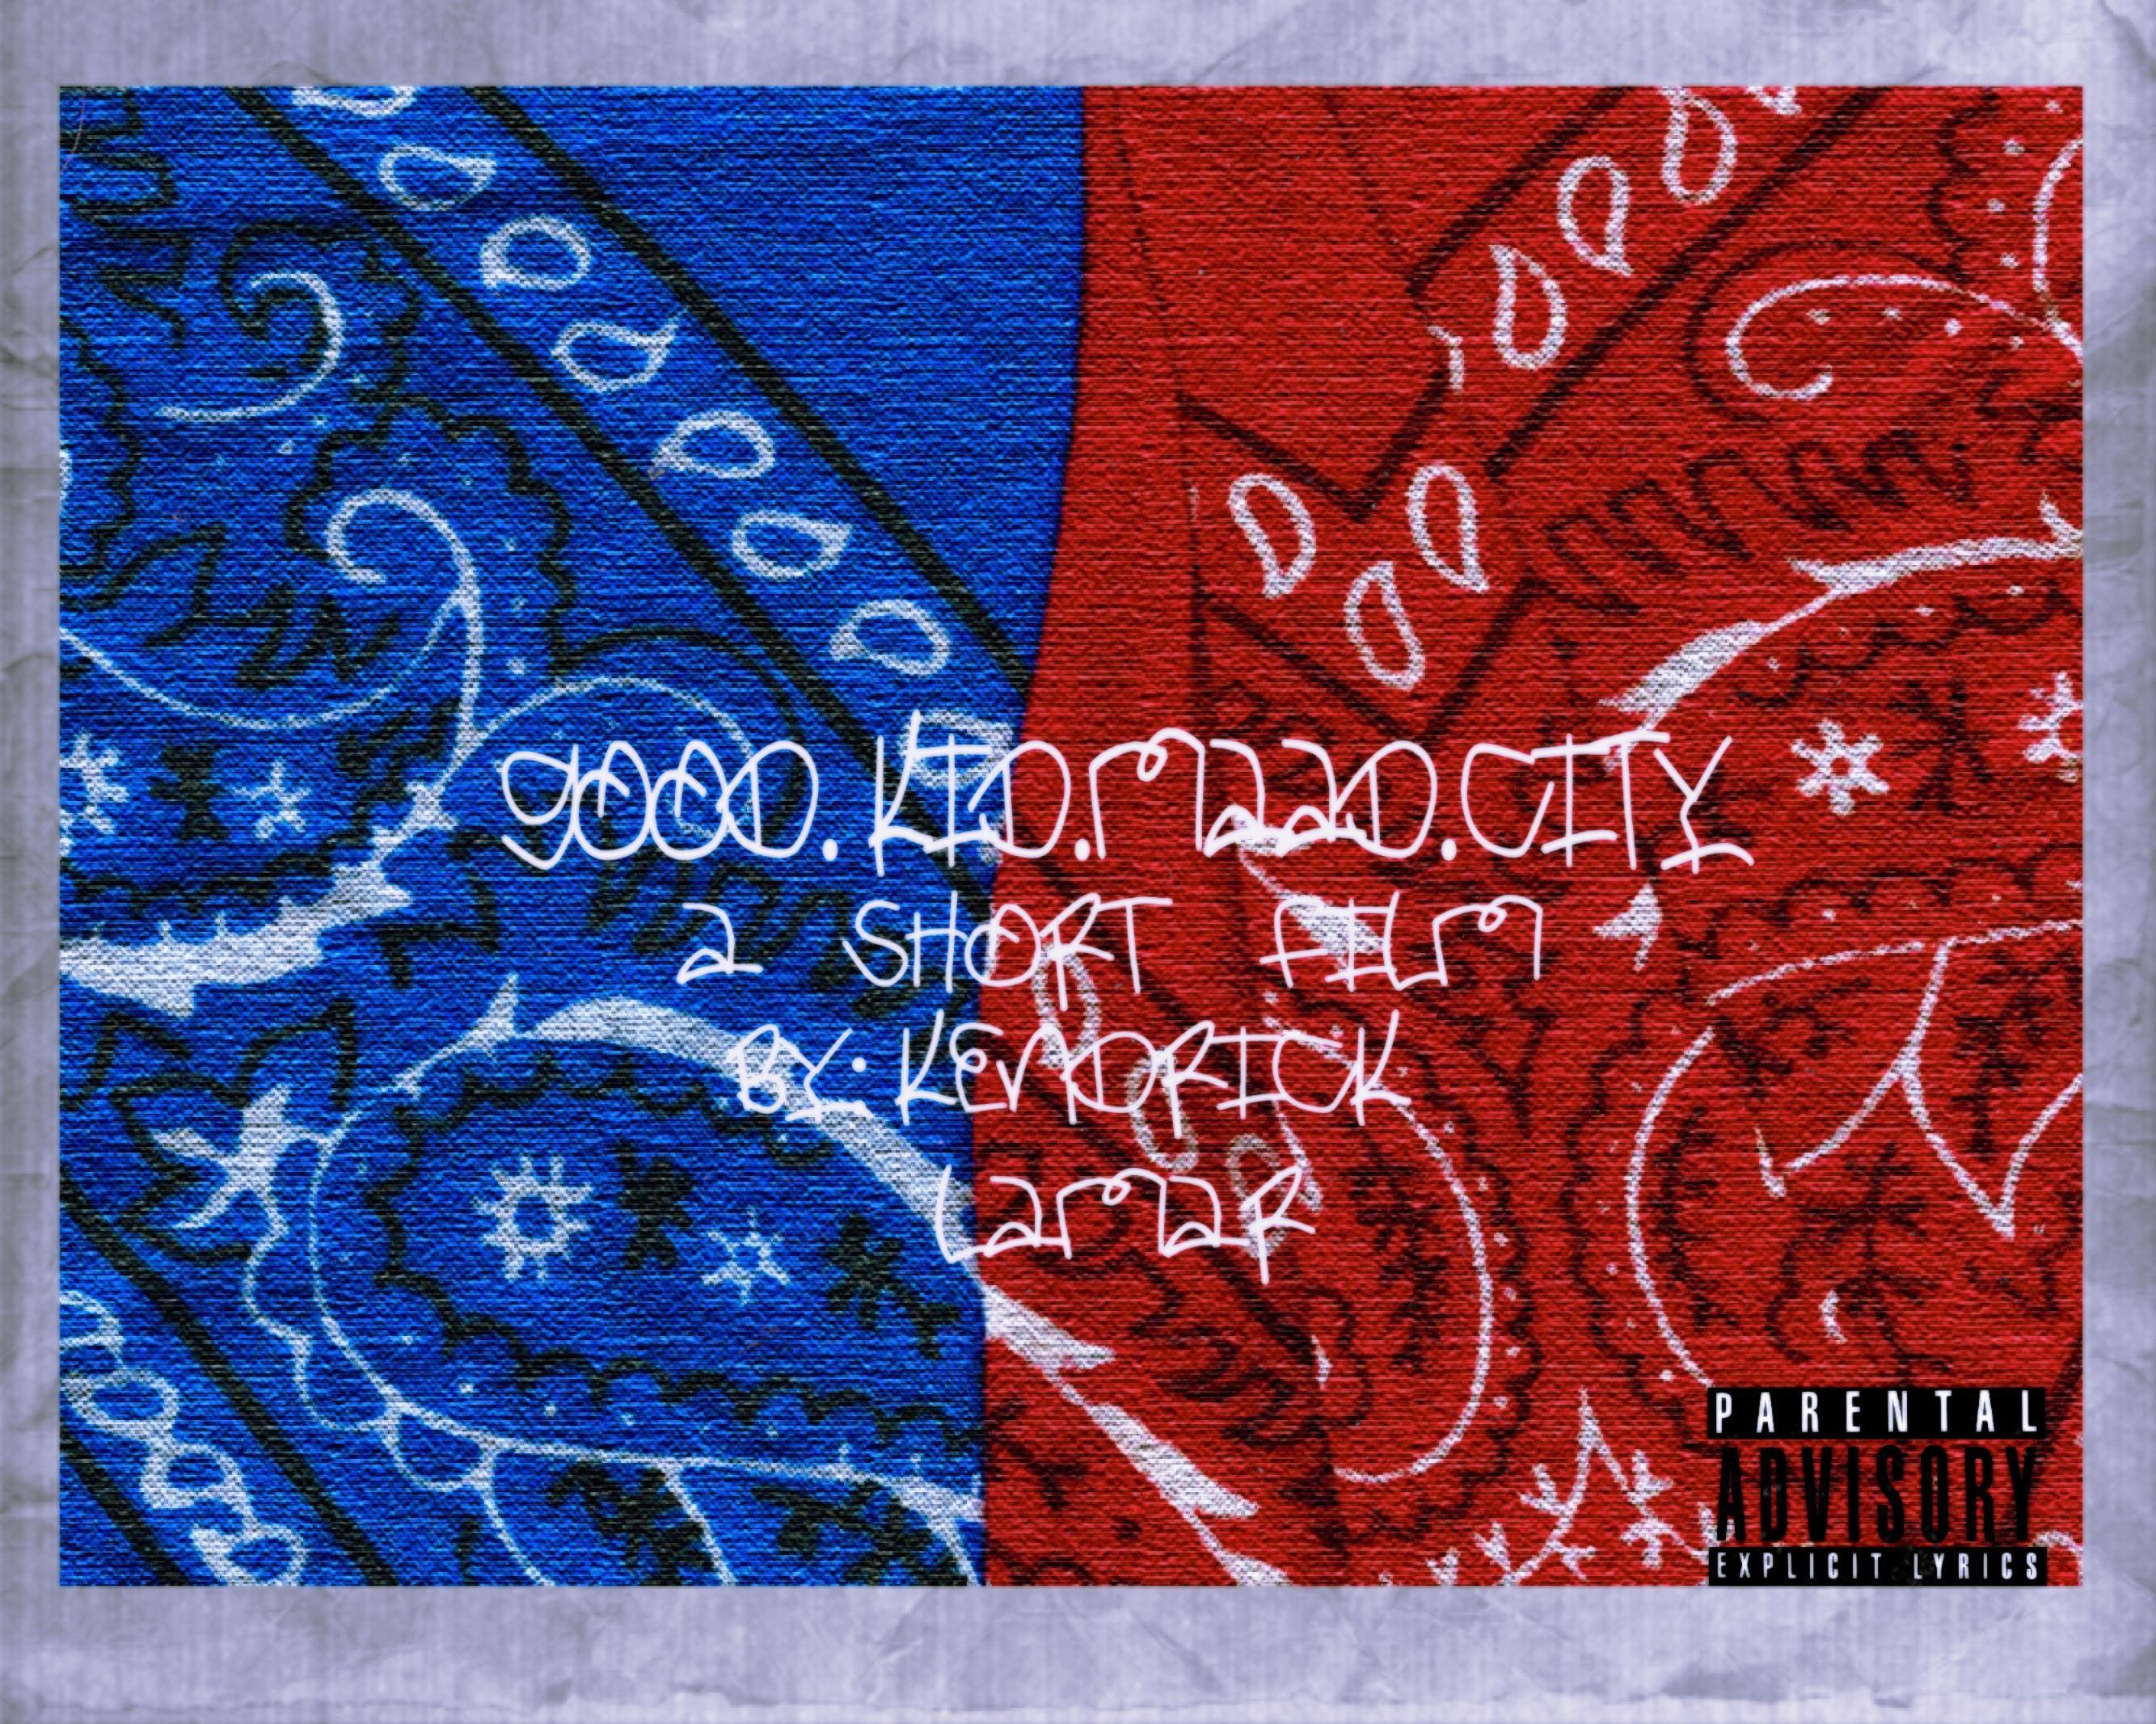 Good Kid Maad City Album Art By Me In 2020 Good Kid Maad City City Art Album Art